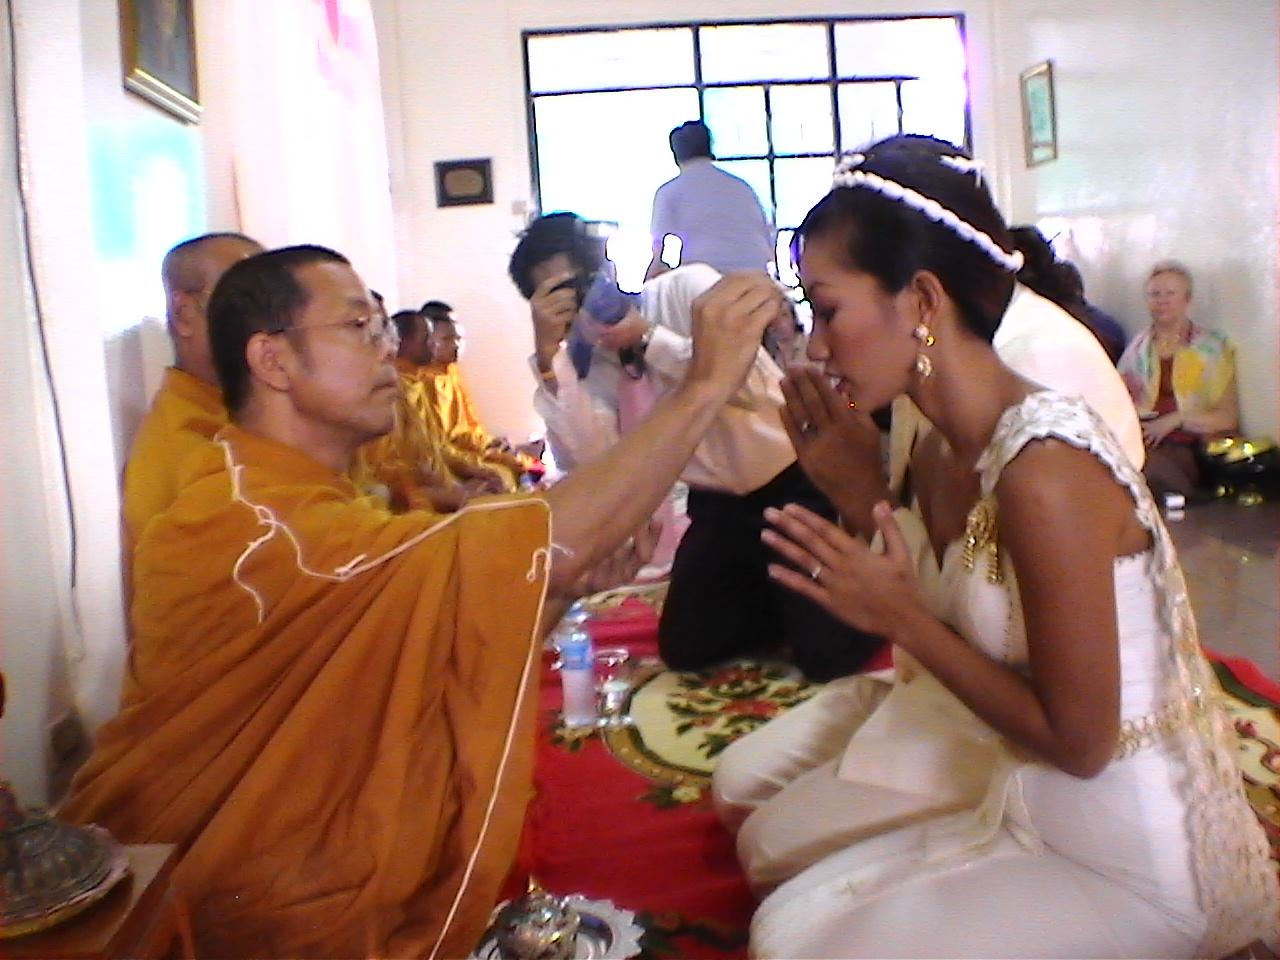 Les moines au mariage de David ISMALONE et Ying JULALUKE (2006)